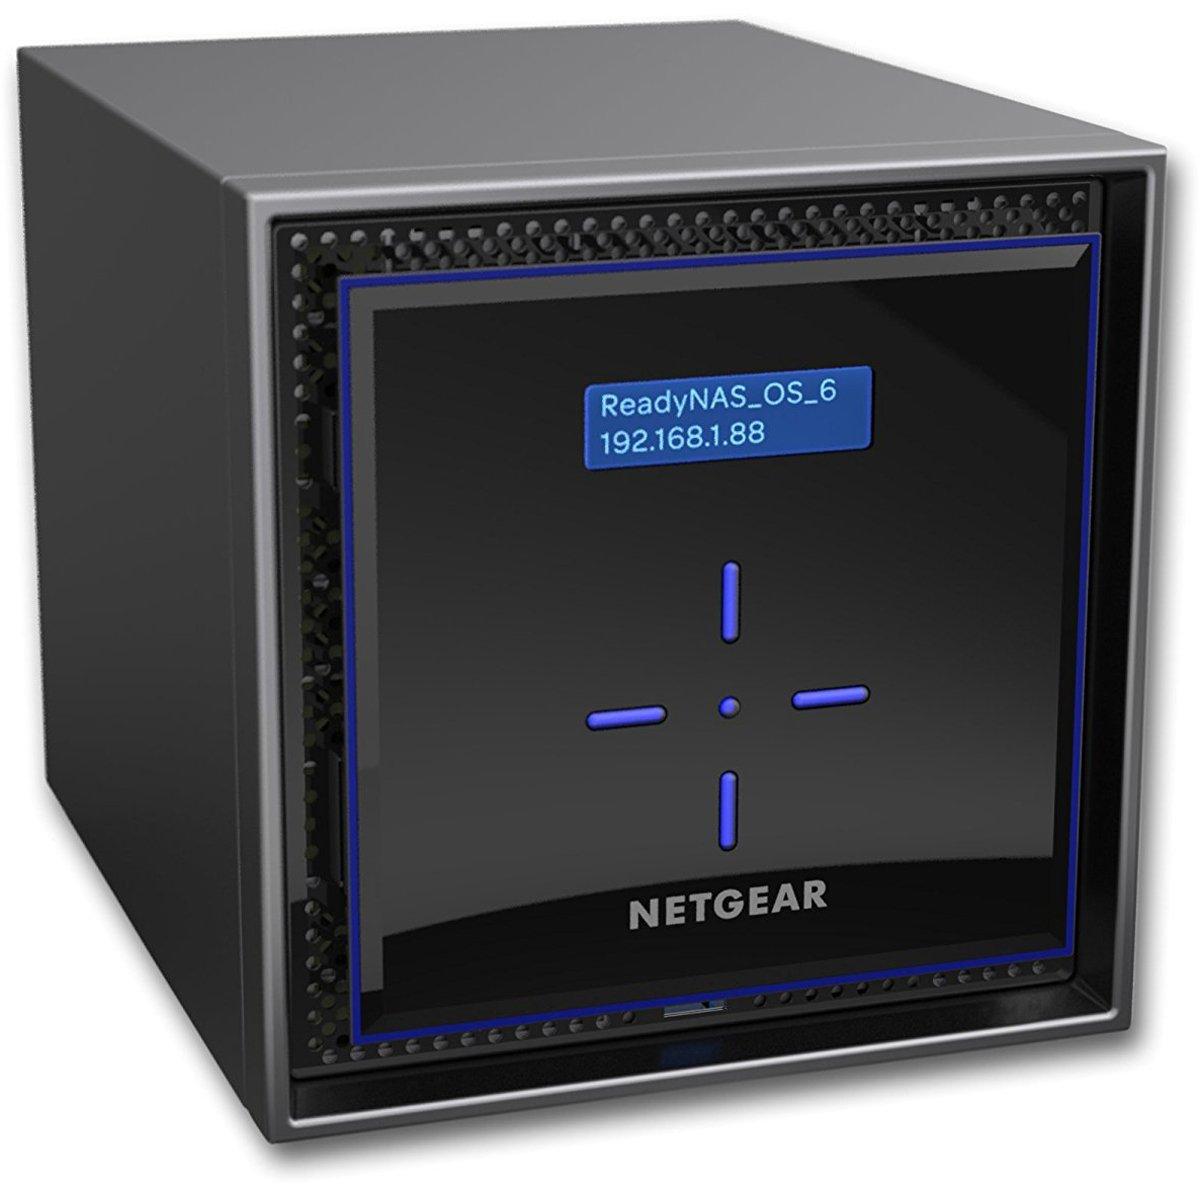 NETGEAR ReadyNAS RN424 4 Bay Diskless High Performance NAS, 40TB Capacity Network Attached Storage, Intel 1.5GHz Dual Core Processor, 2GB RAM, (RN42400)